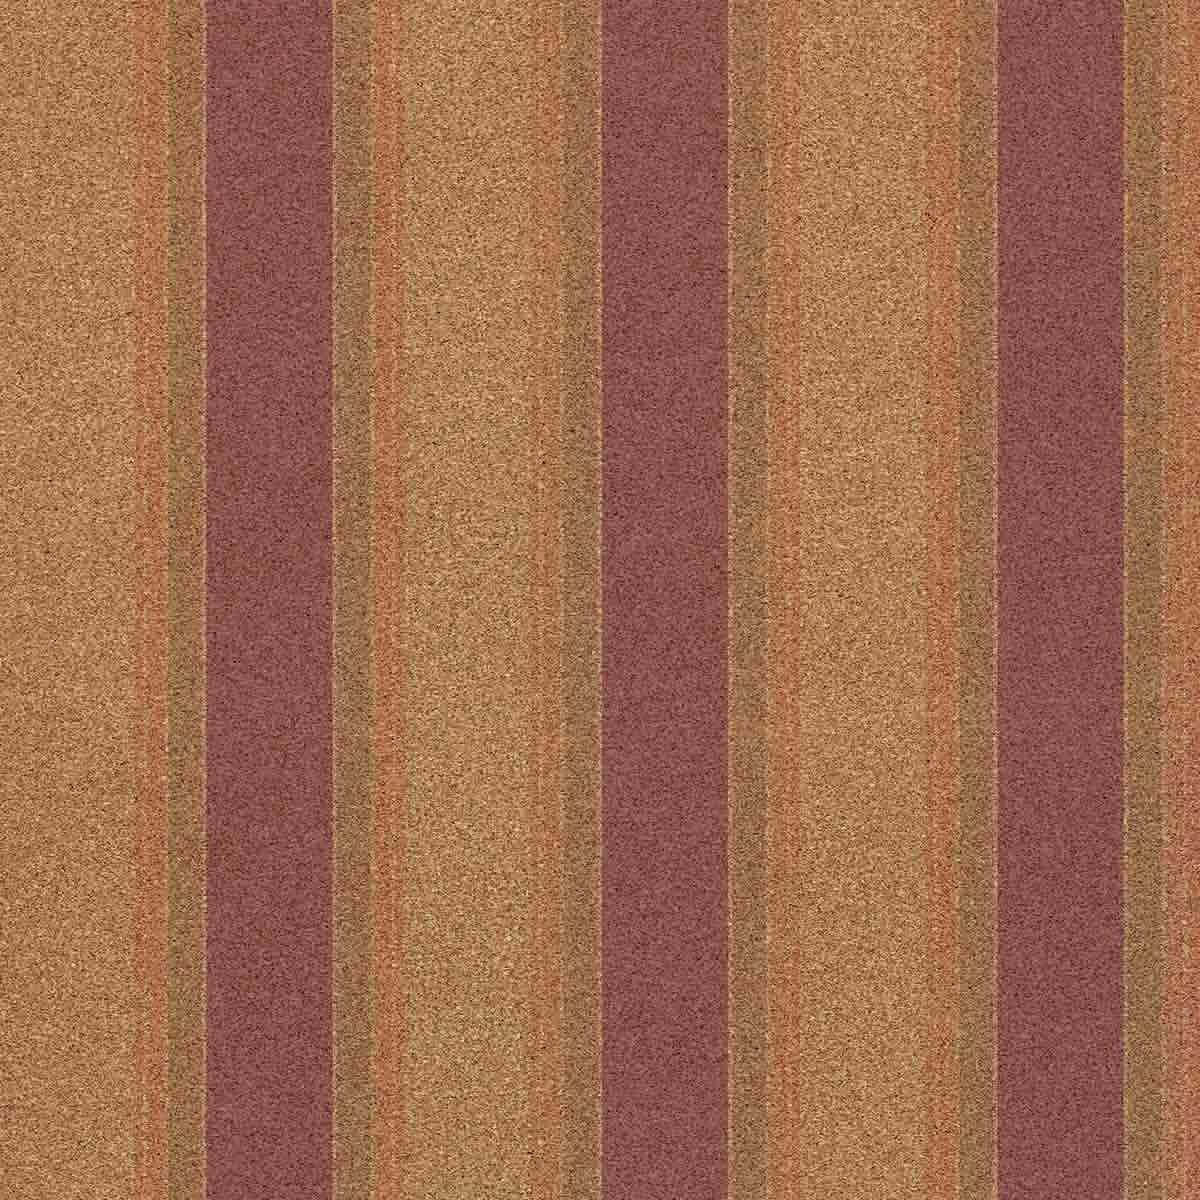 Decorative cork thin paper African Violet Cork